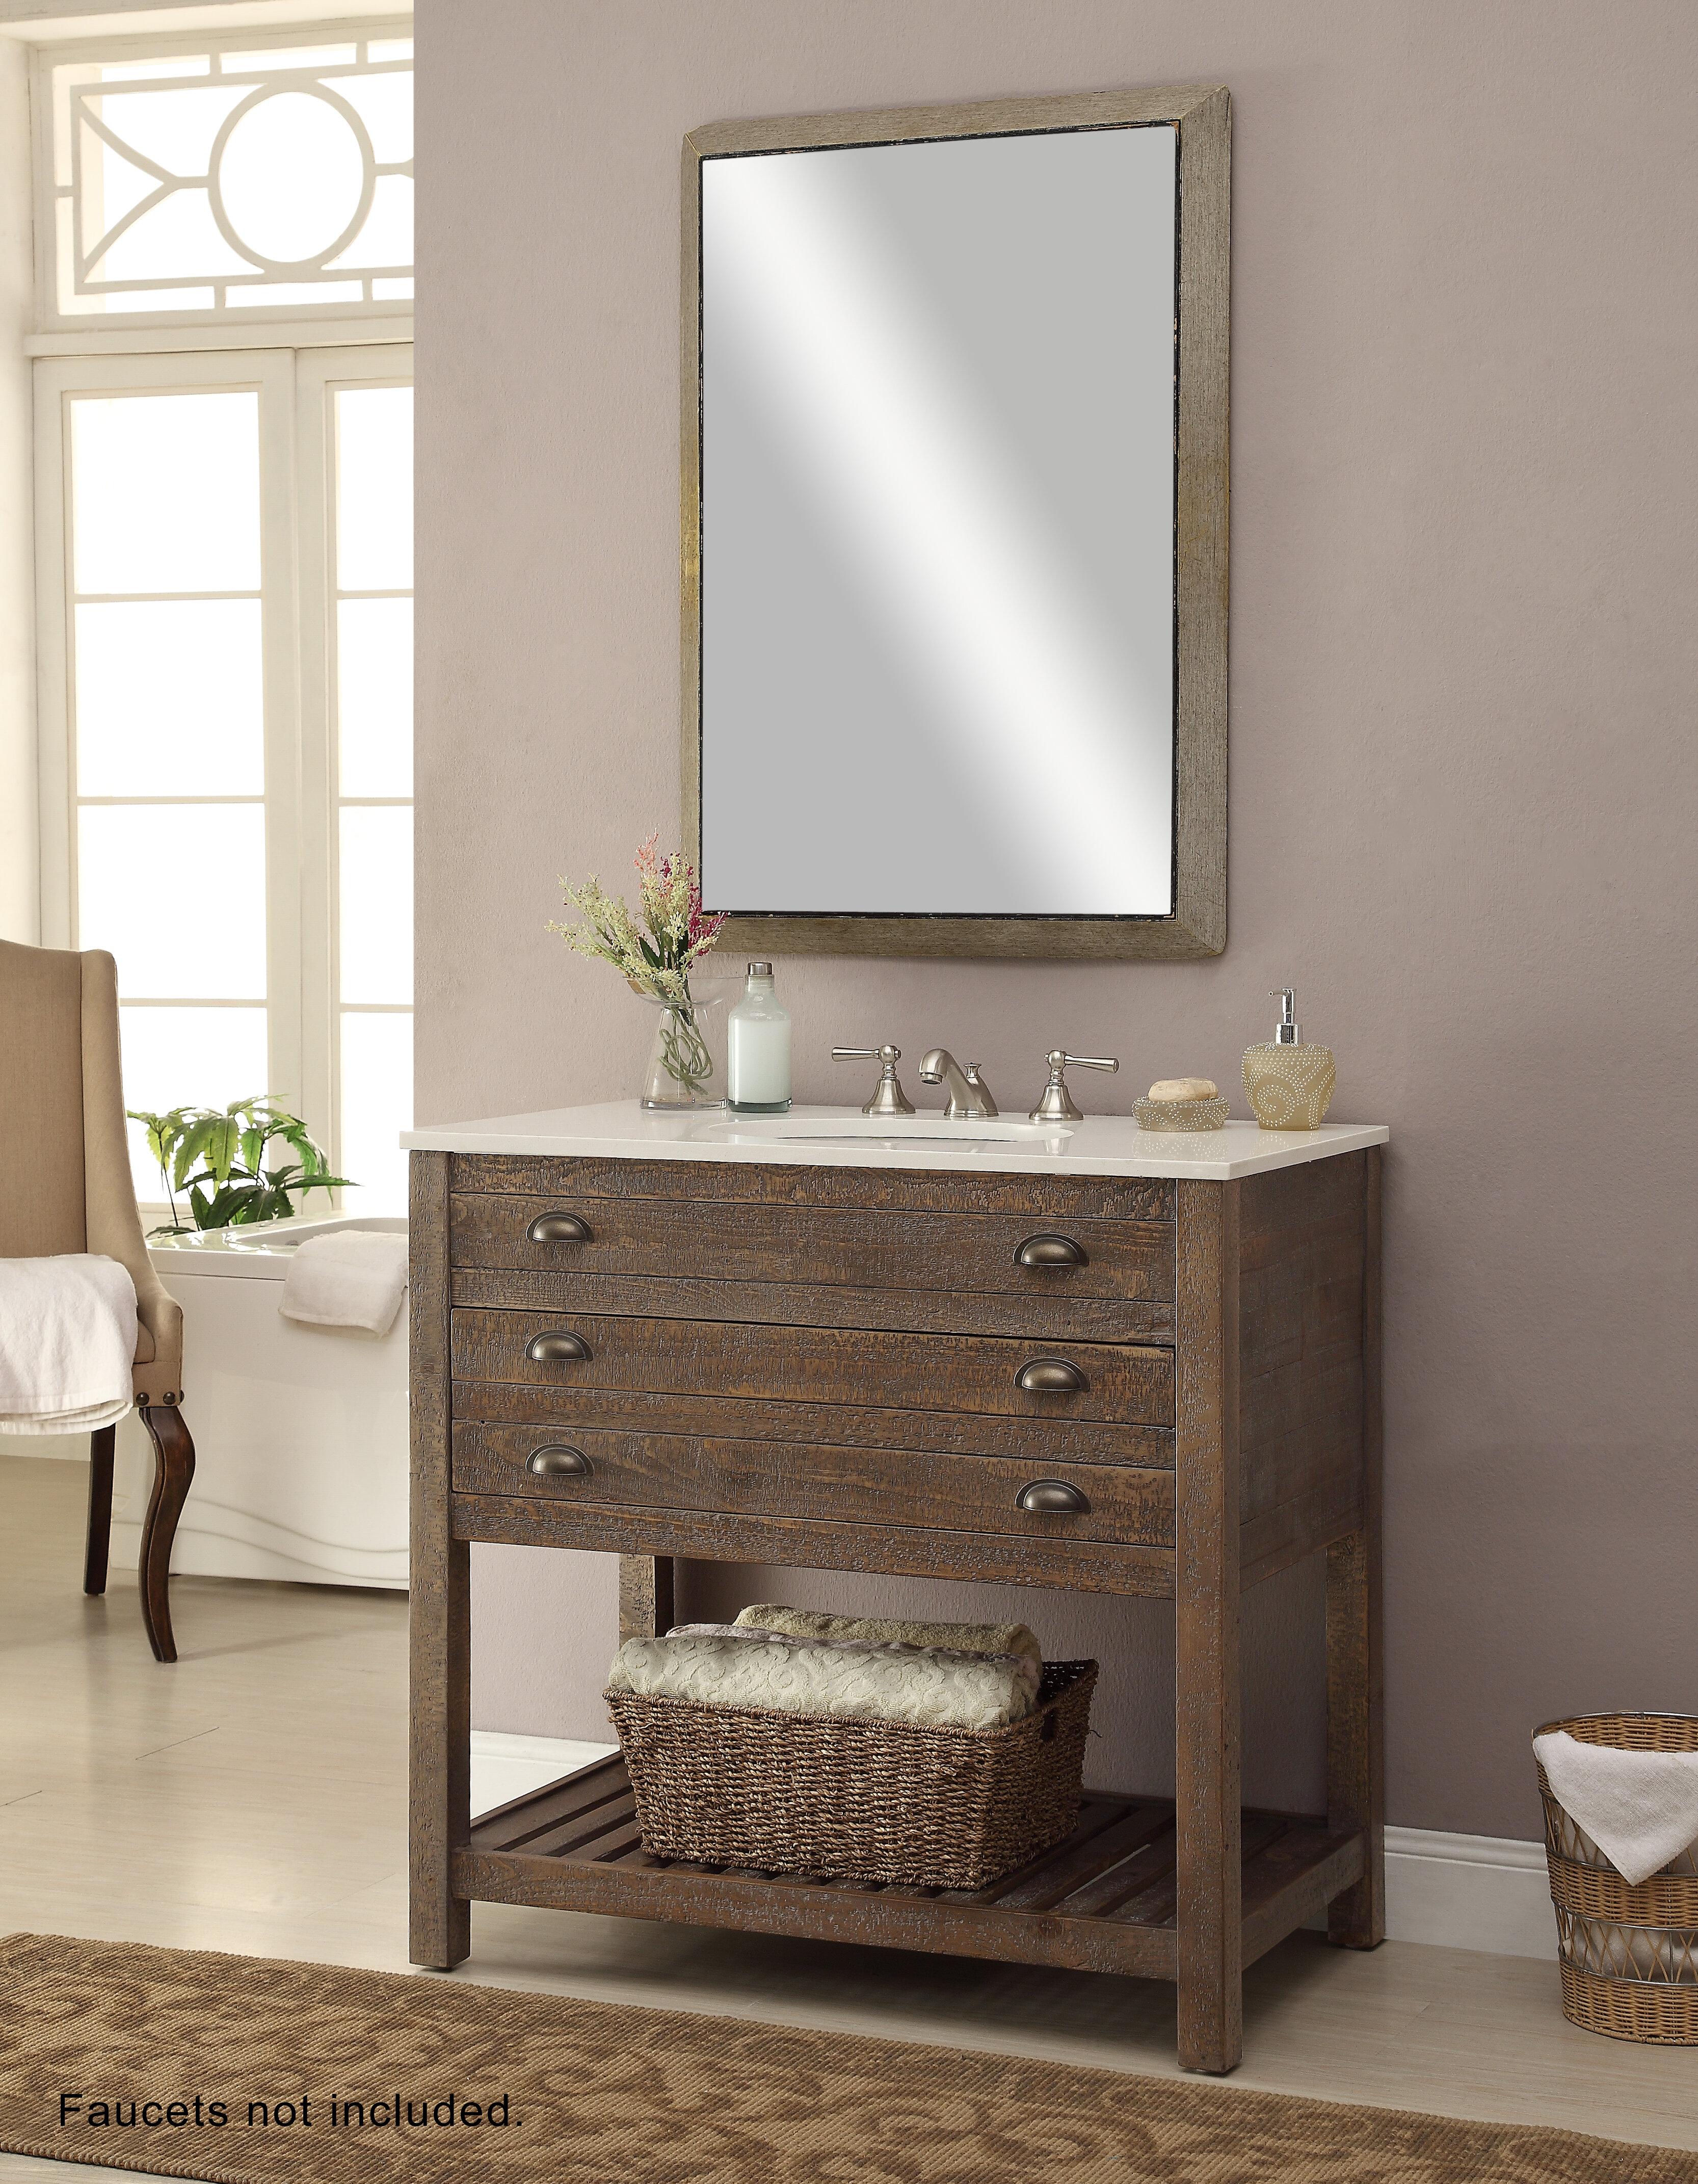 Laurel foundry modern farmhouse russell 36 single sink vanity set reviews wayfair